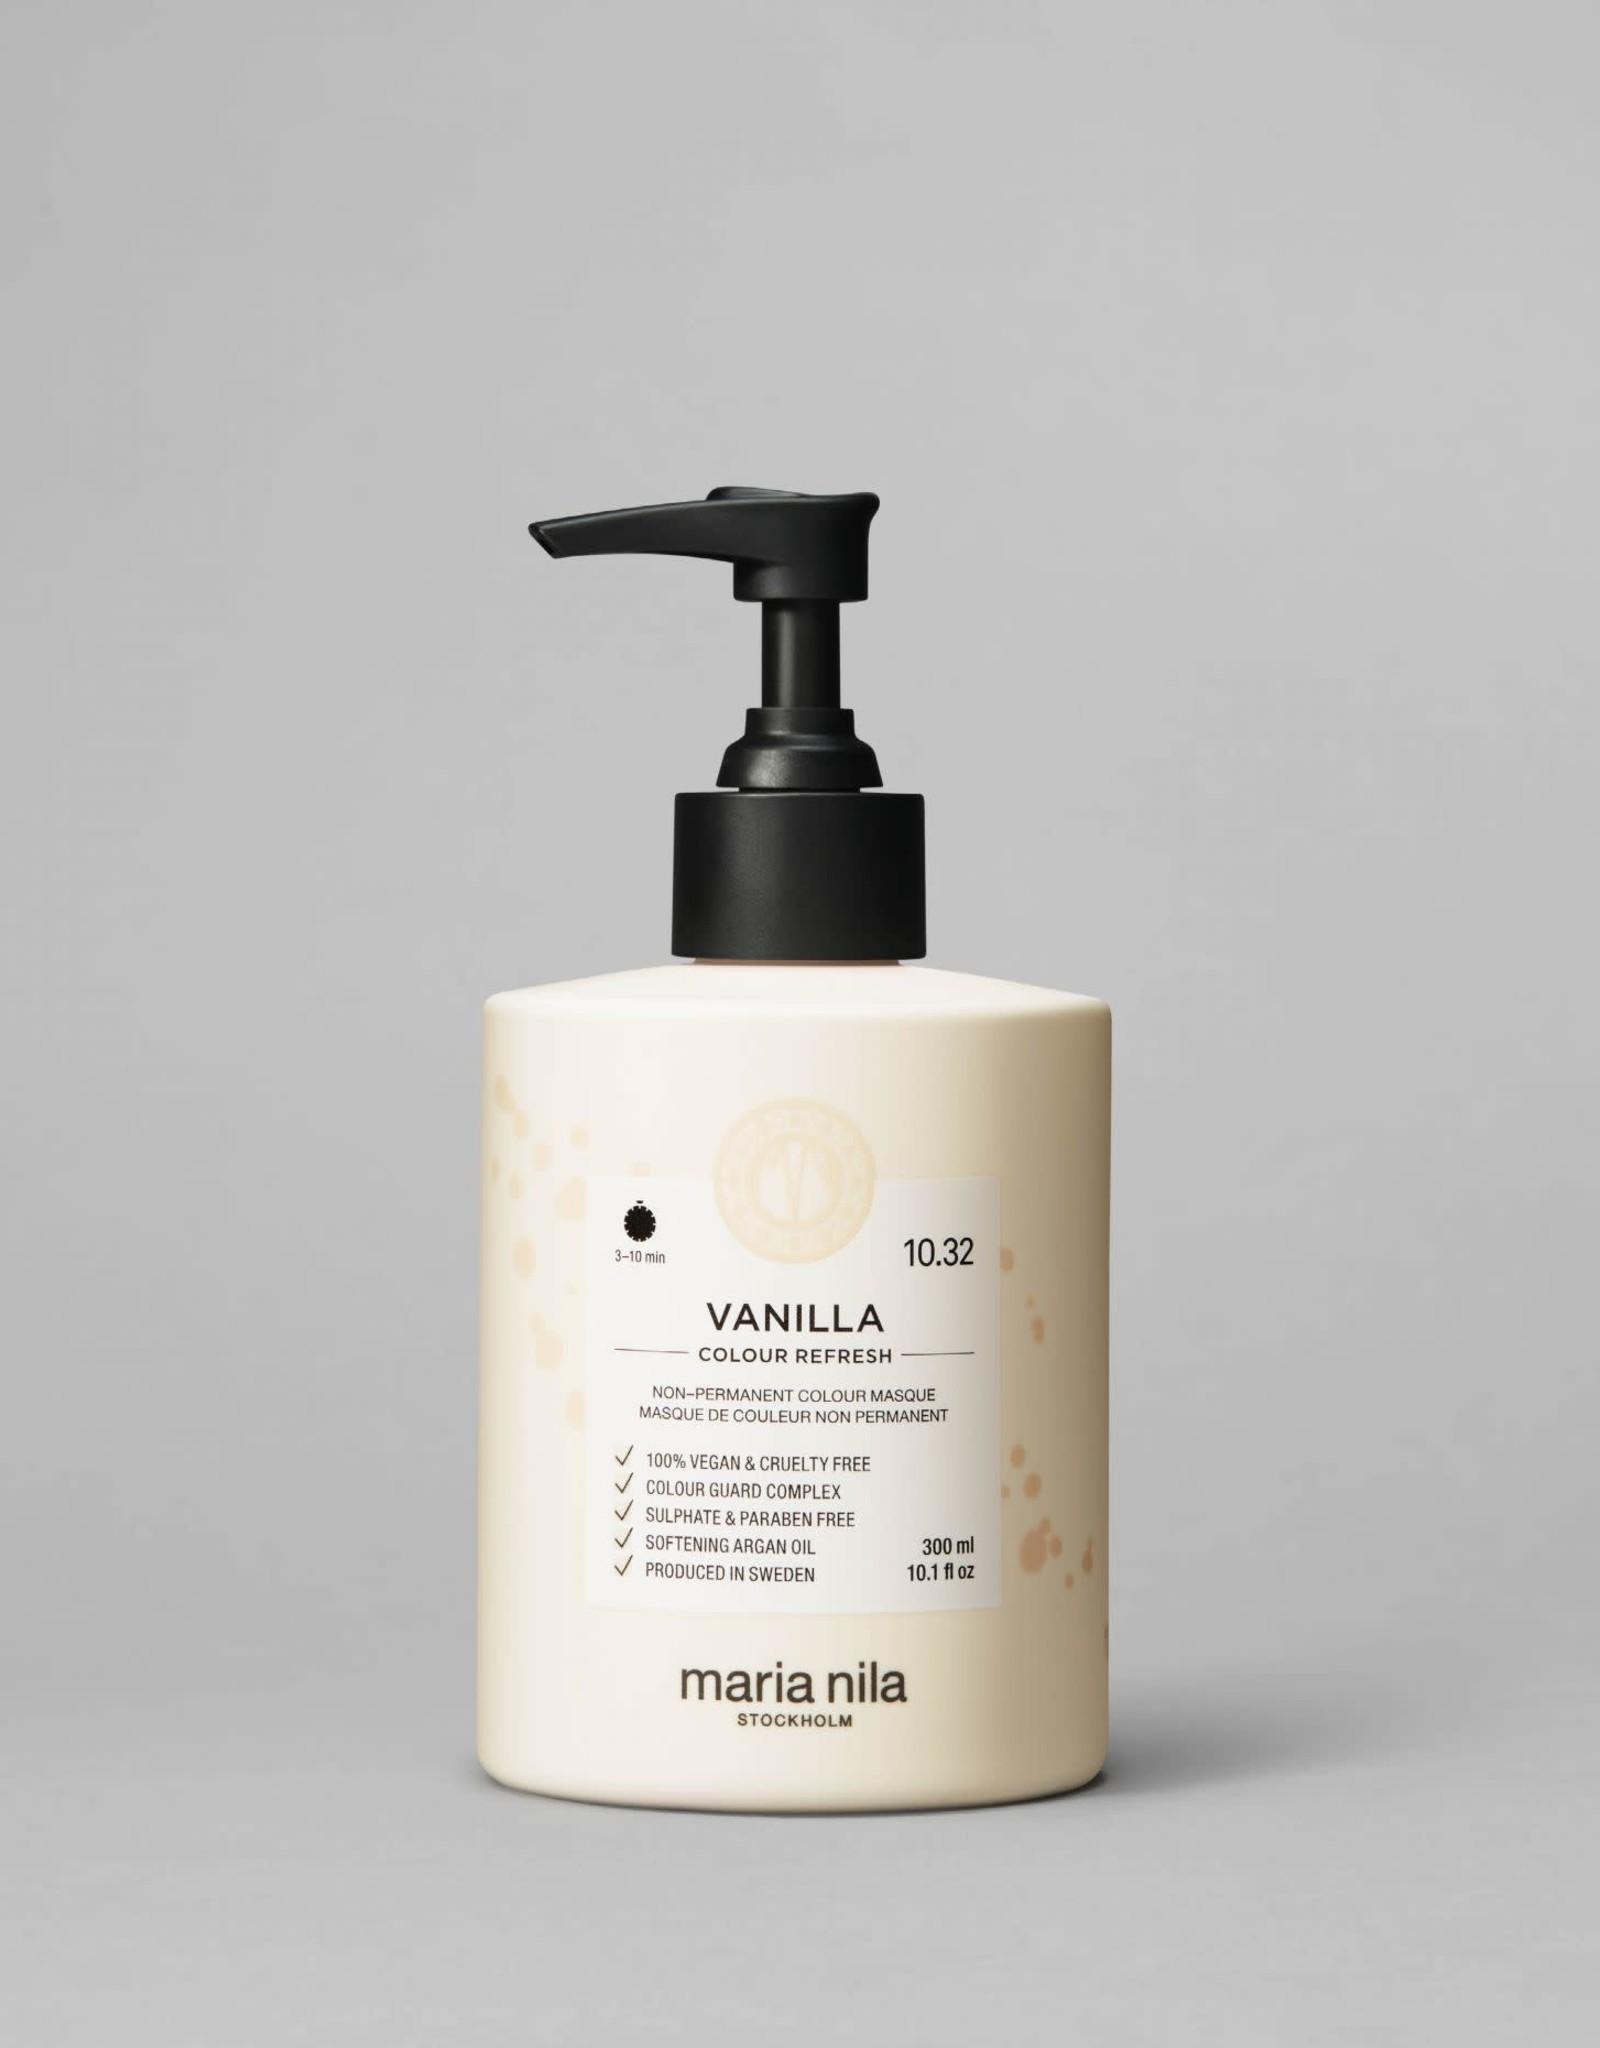 Maria Nila Colour Refresh Vanilla 300ml